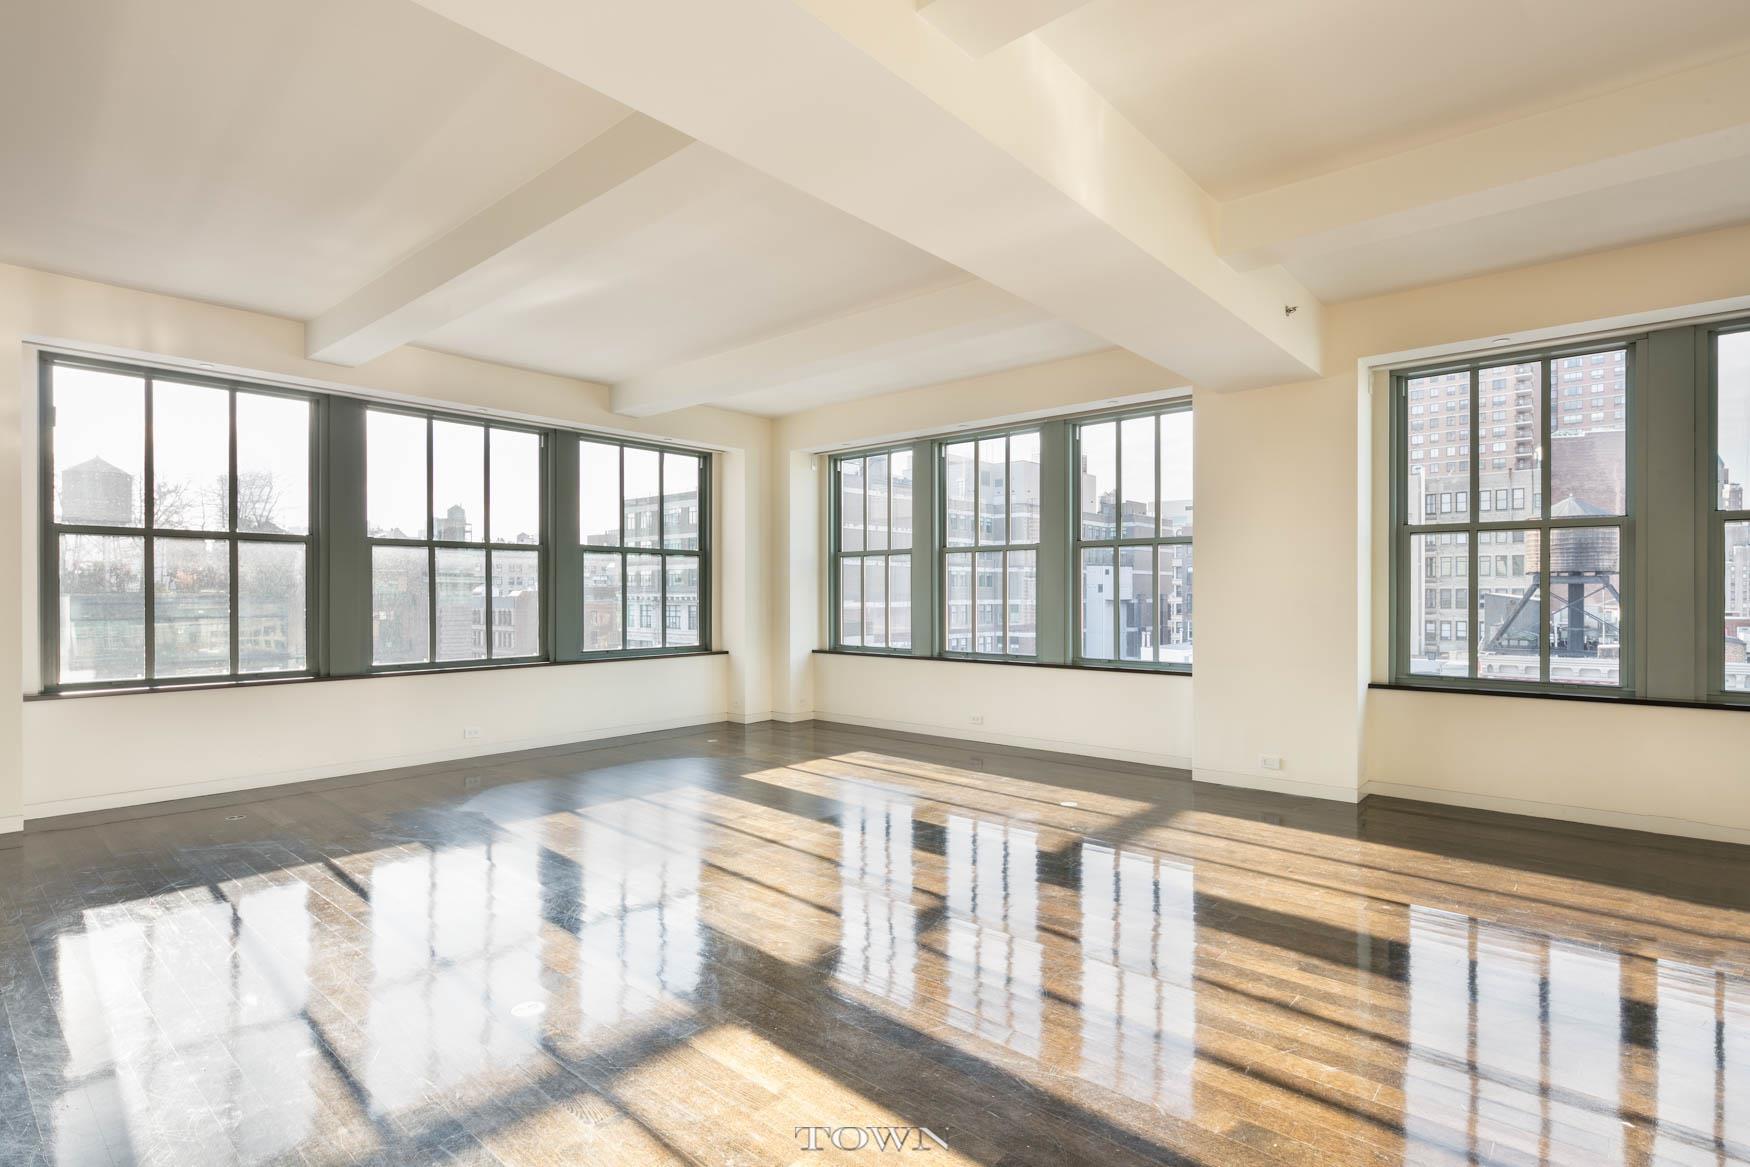 Condominium for Rent at The Carl Fischer Buildings, 62 Cooper Square, #10-B 62 Cooper Square New York, New York 10003 United States